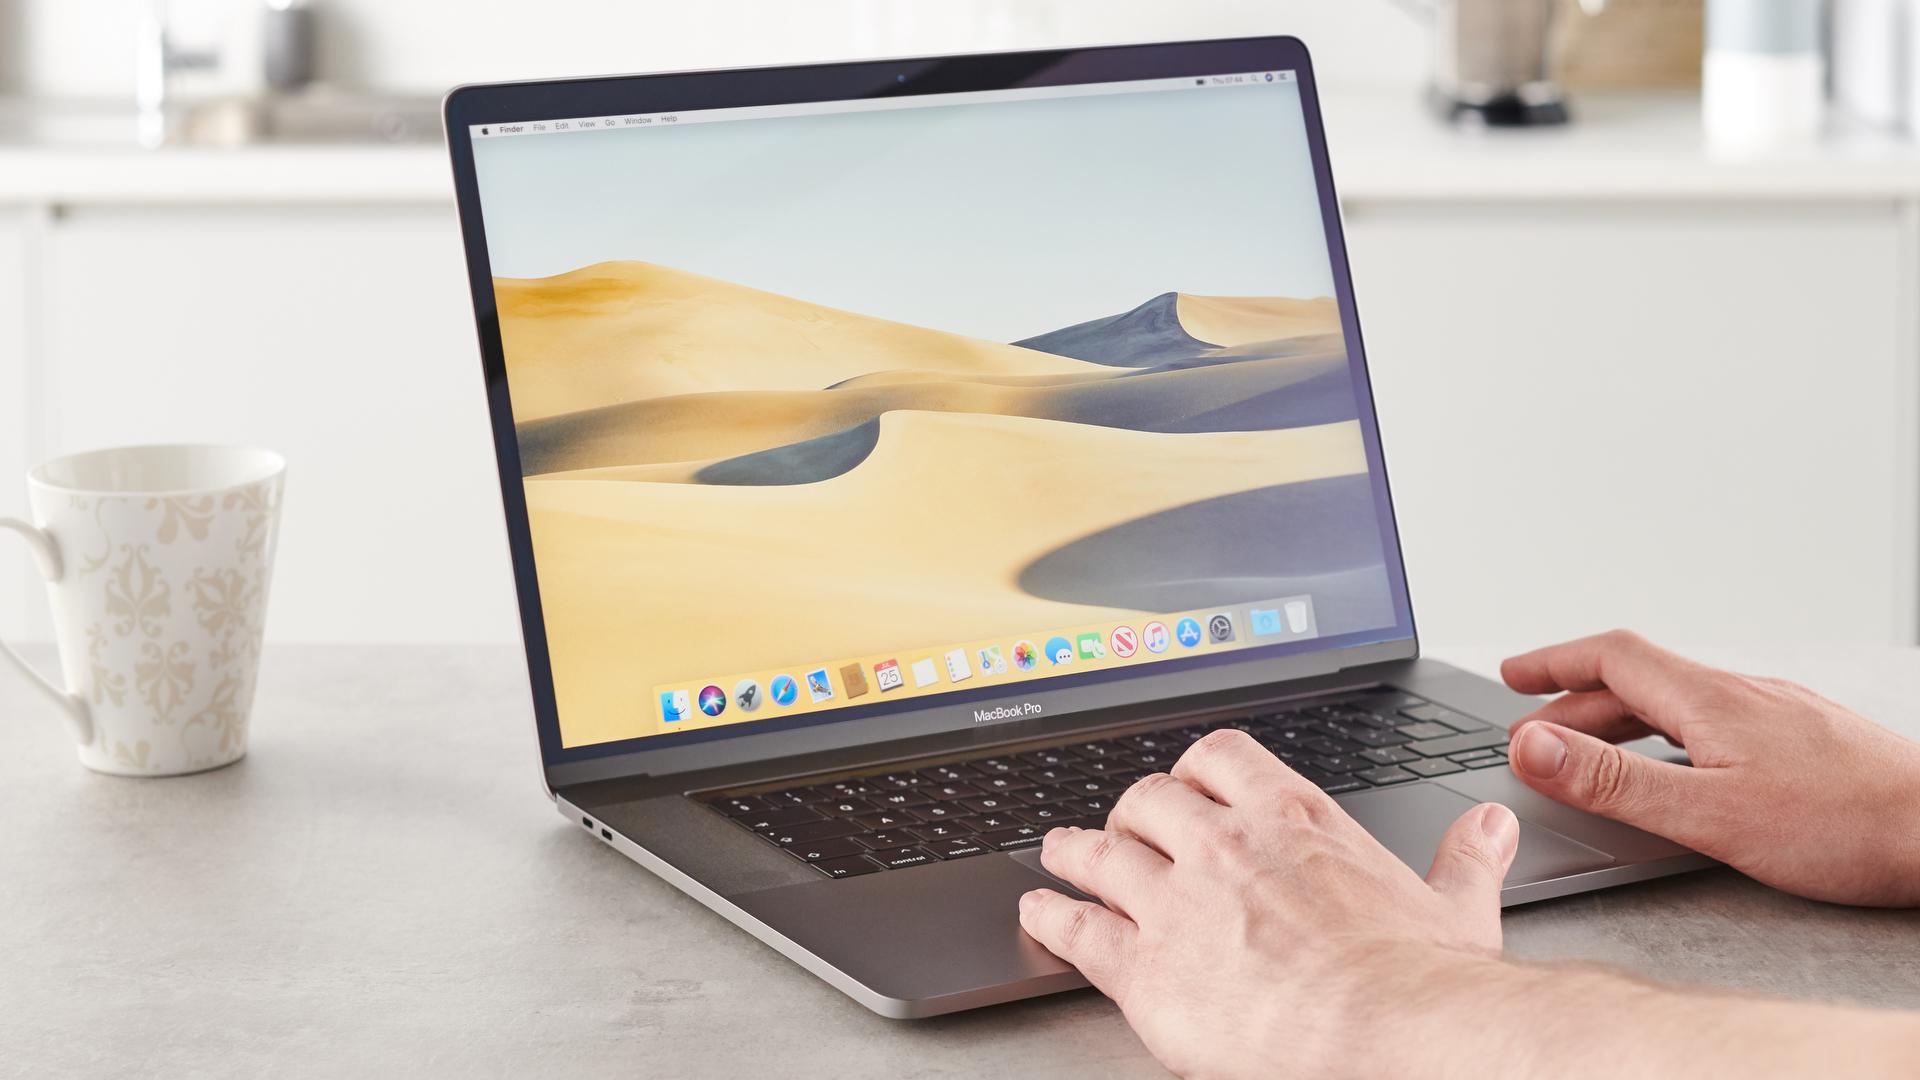 Apple MacBook Pro (15-inch. 2019) review